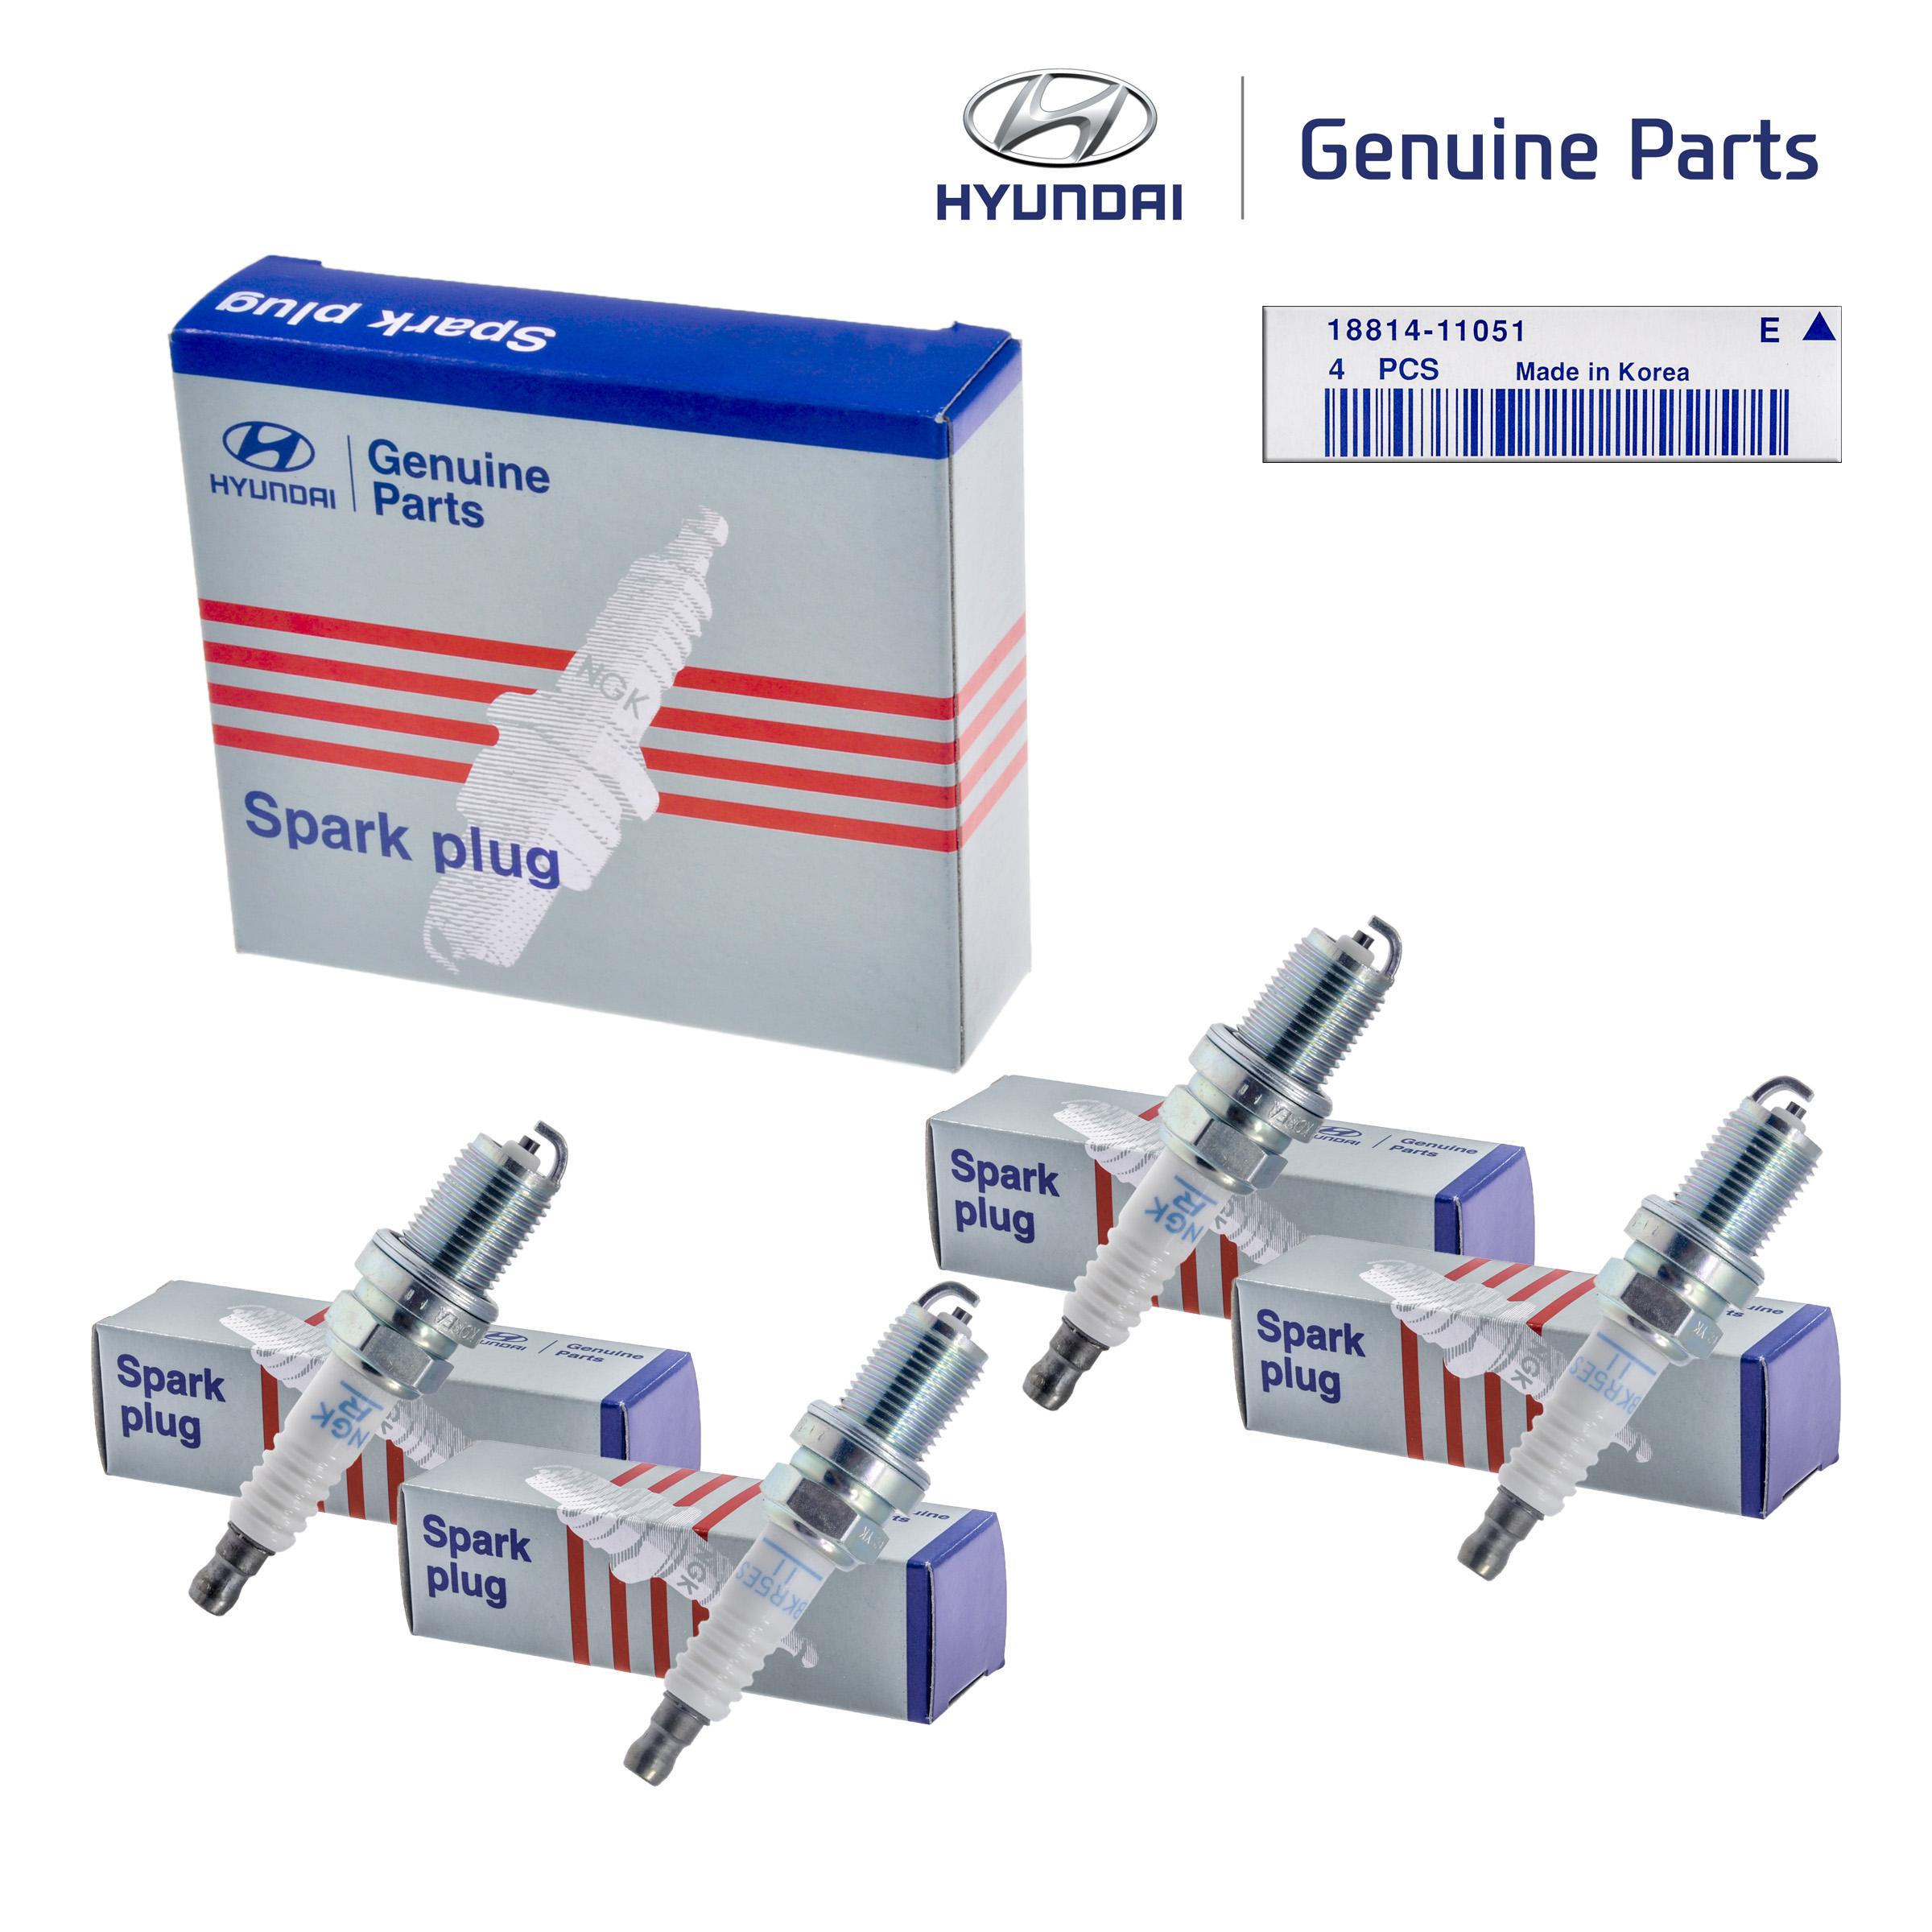 Genuine OEM Spark Plug 18814-11051 For Hyundai//Kia 1993-2011